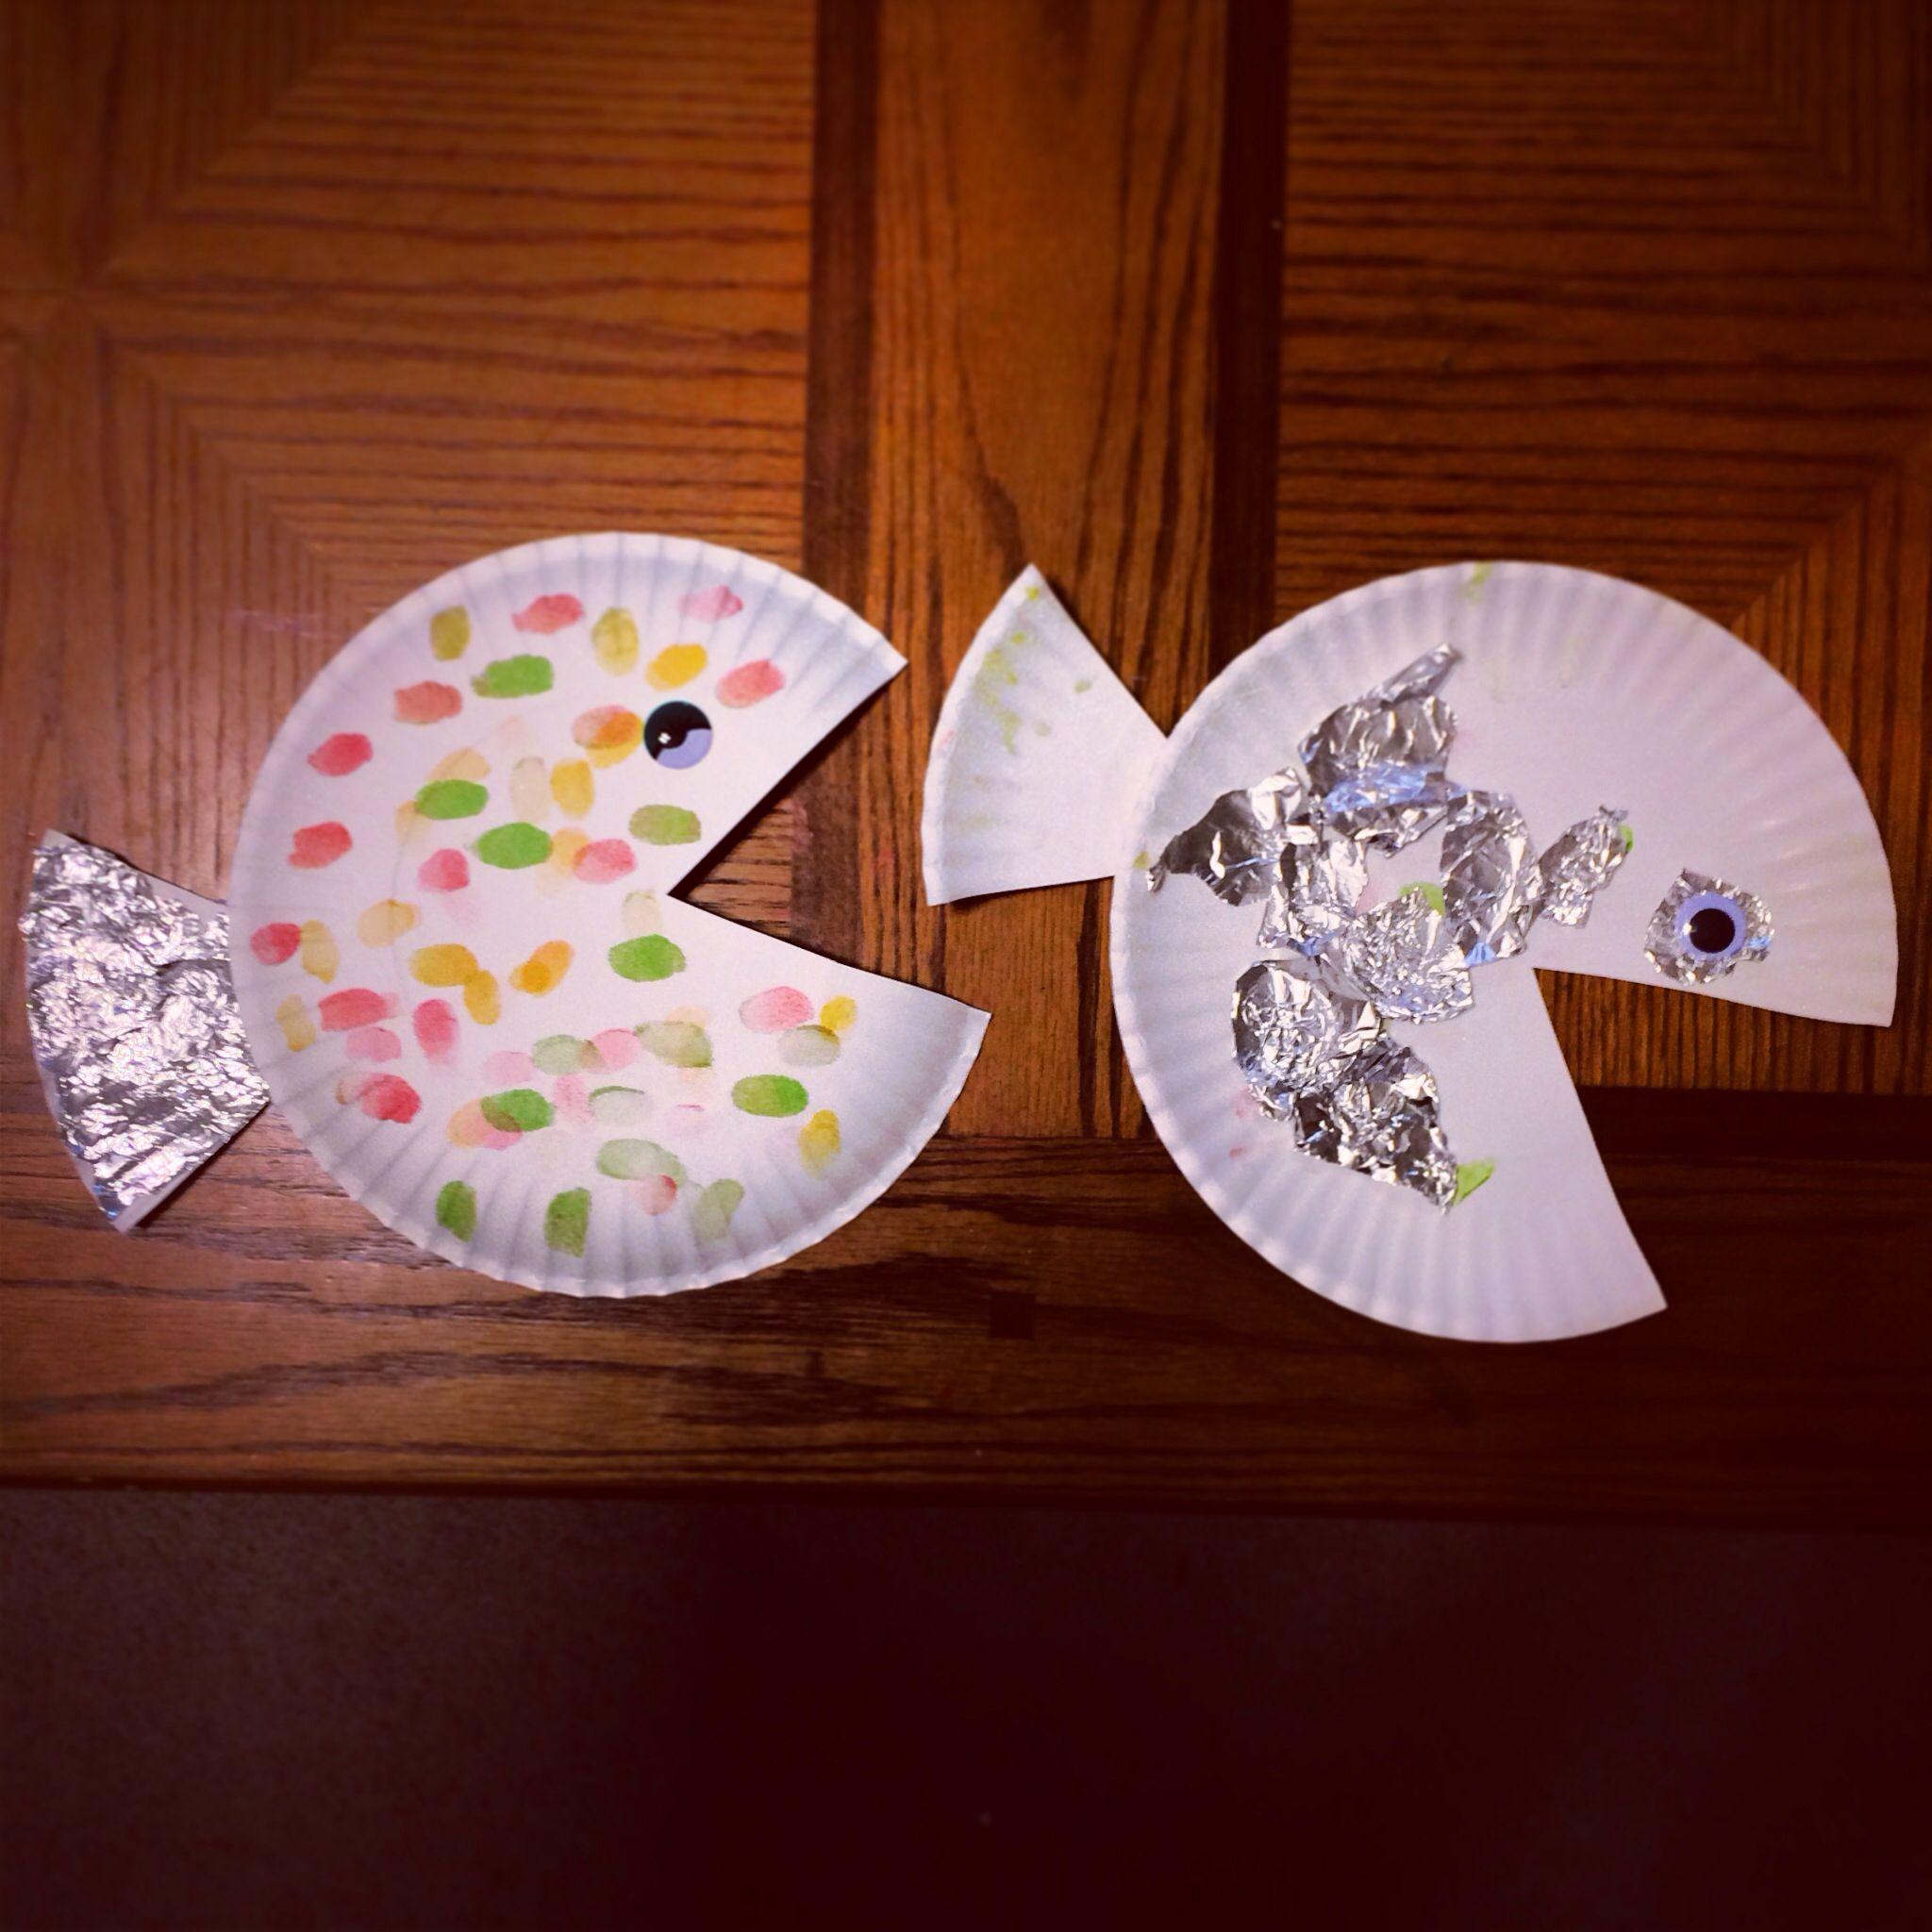 fish plate craft creativesitters paper plate crafts pinterest